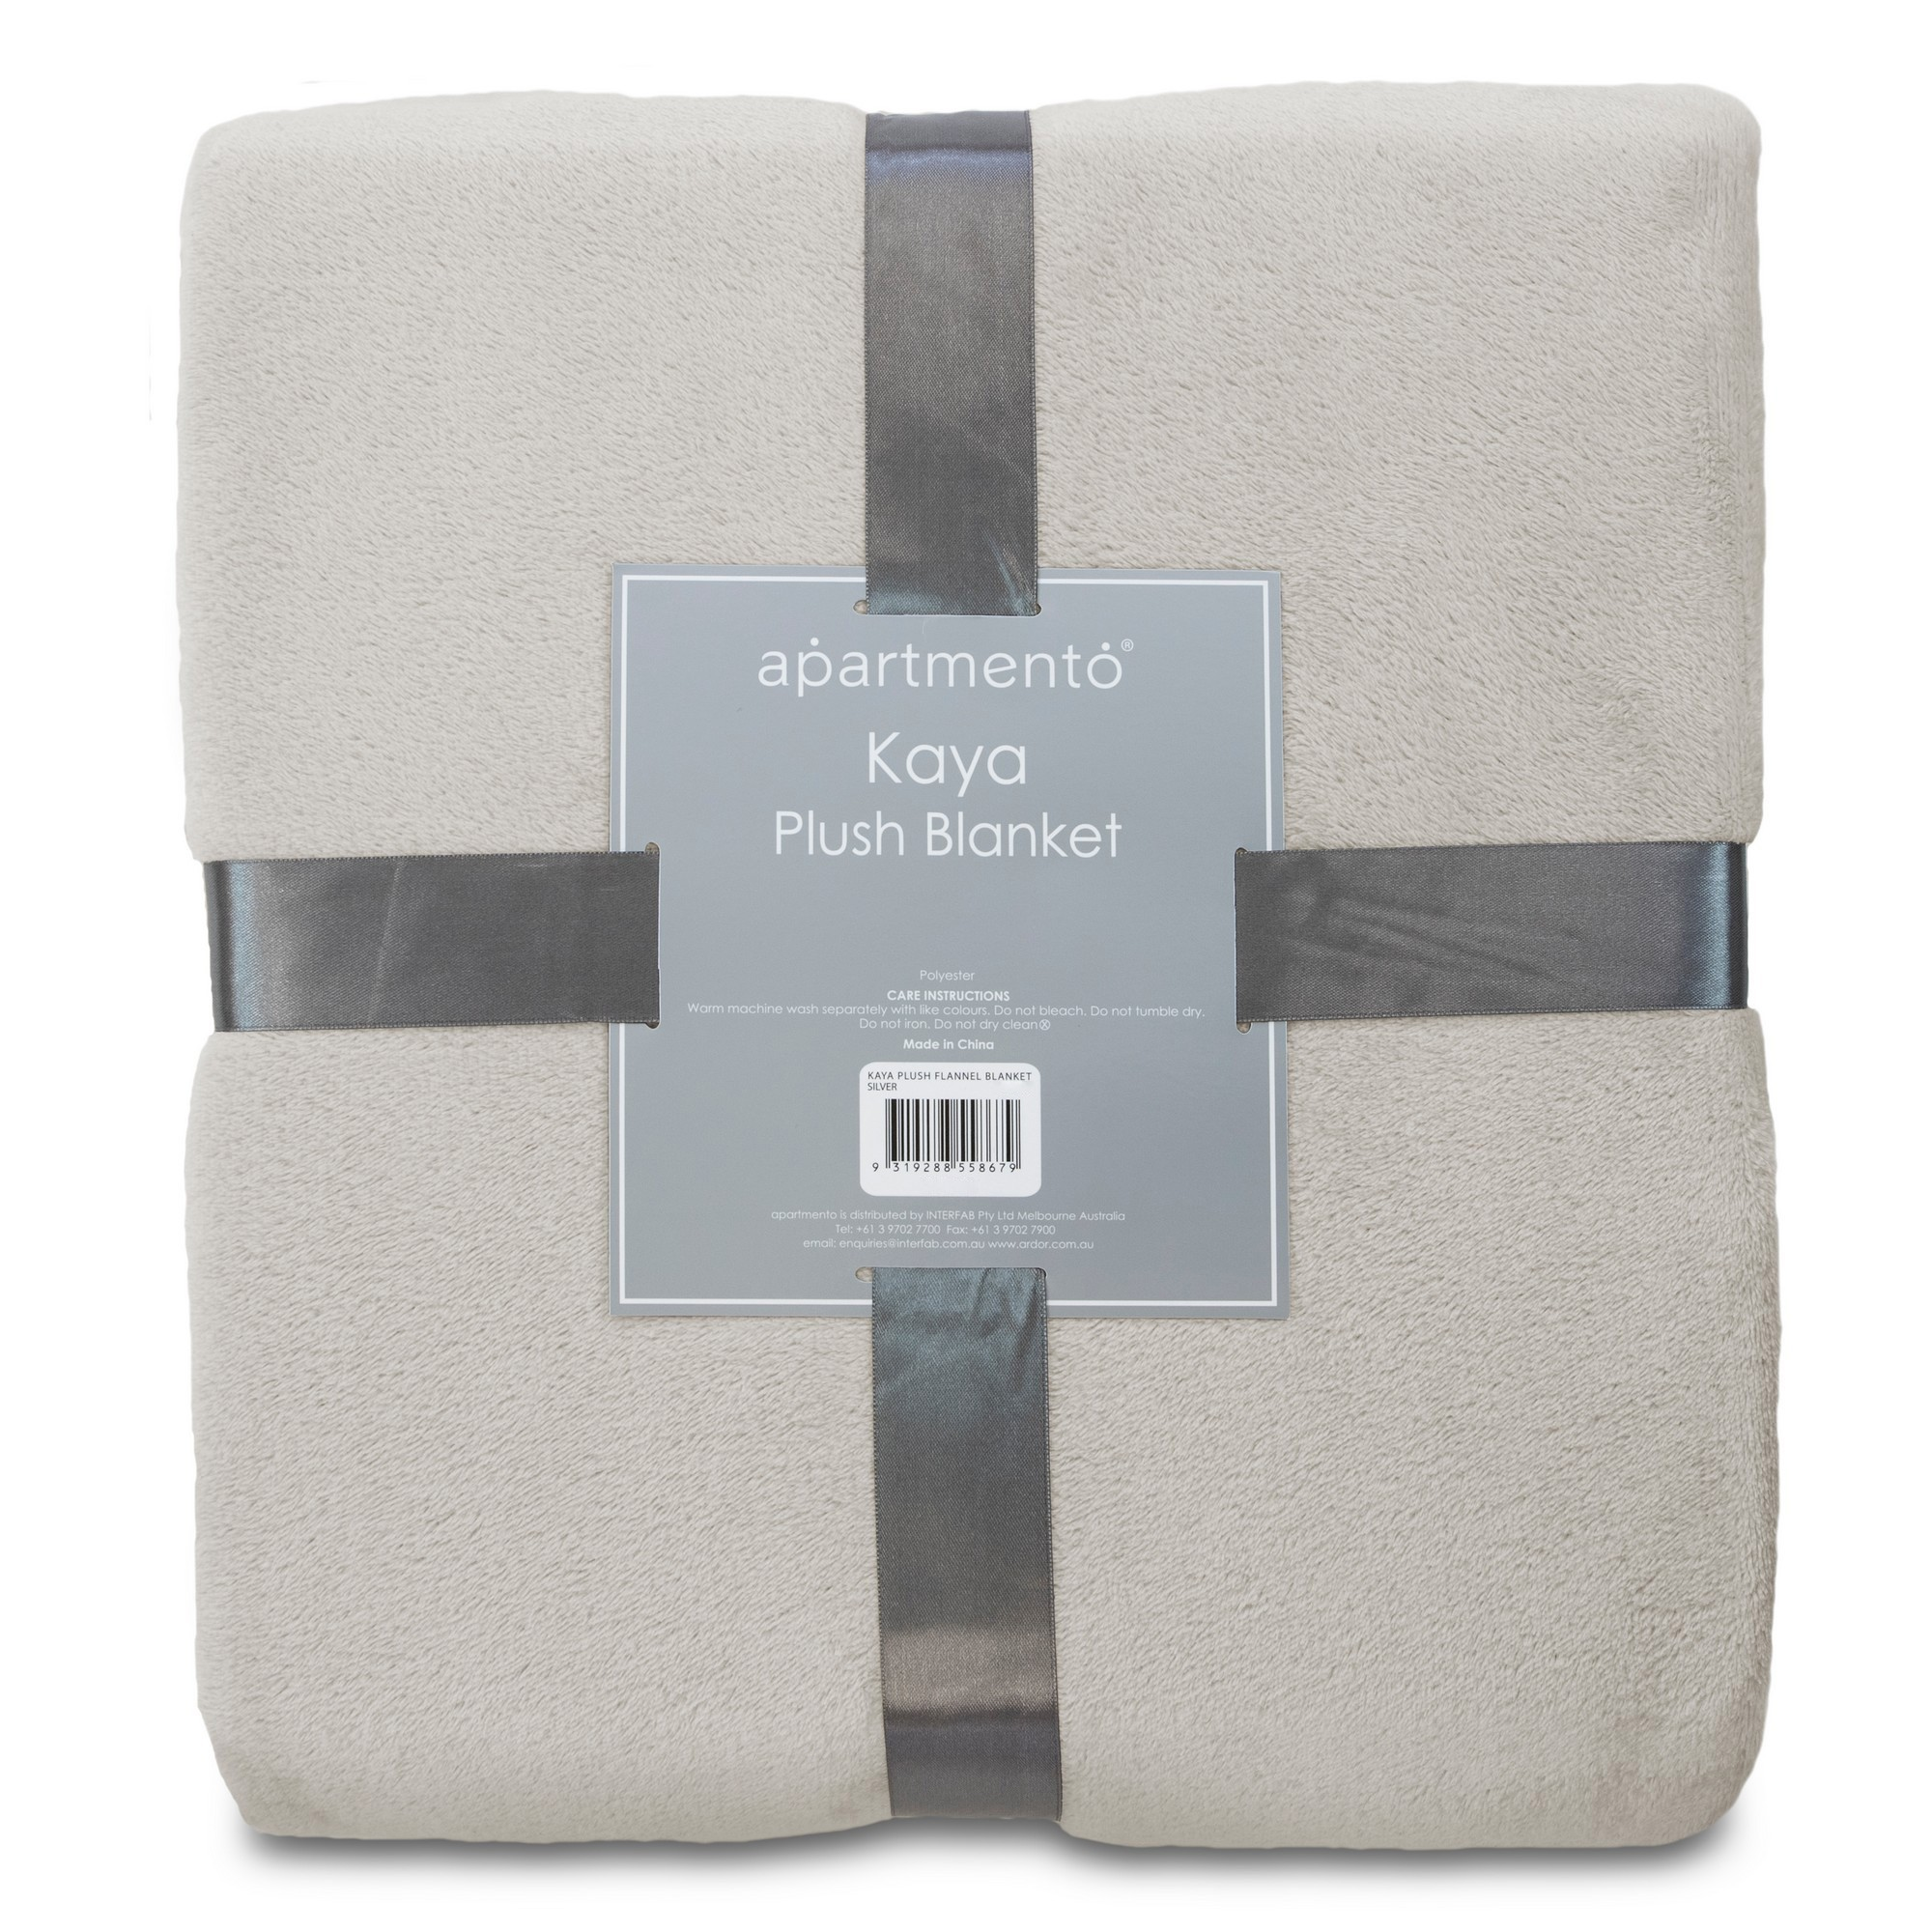 Apartmento Kaya Flannel Plush Blanket, 160x228cm, Silver